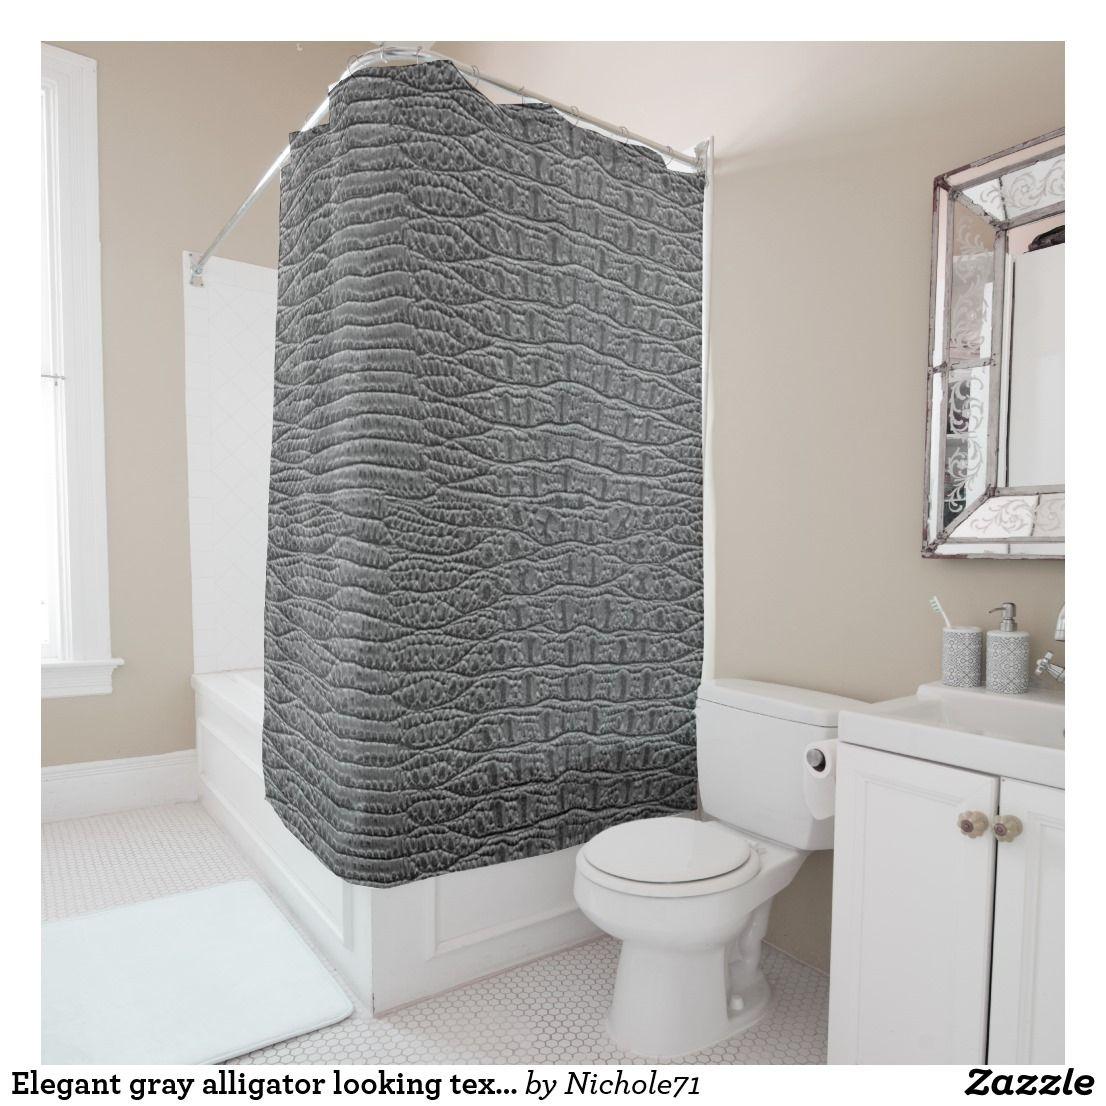 Elegant Gray Alligator Looking Texture Shower Curtain Zazzle Com